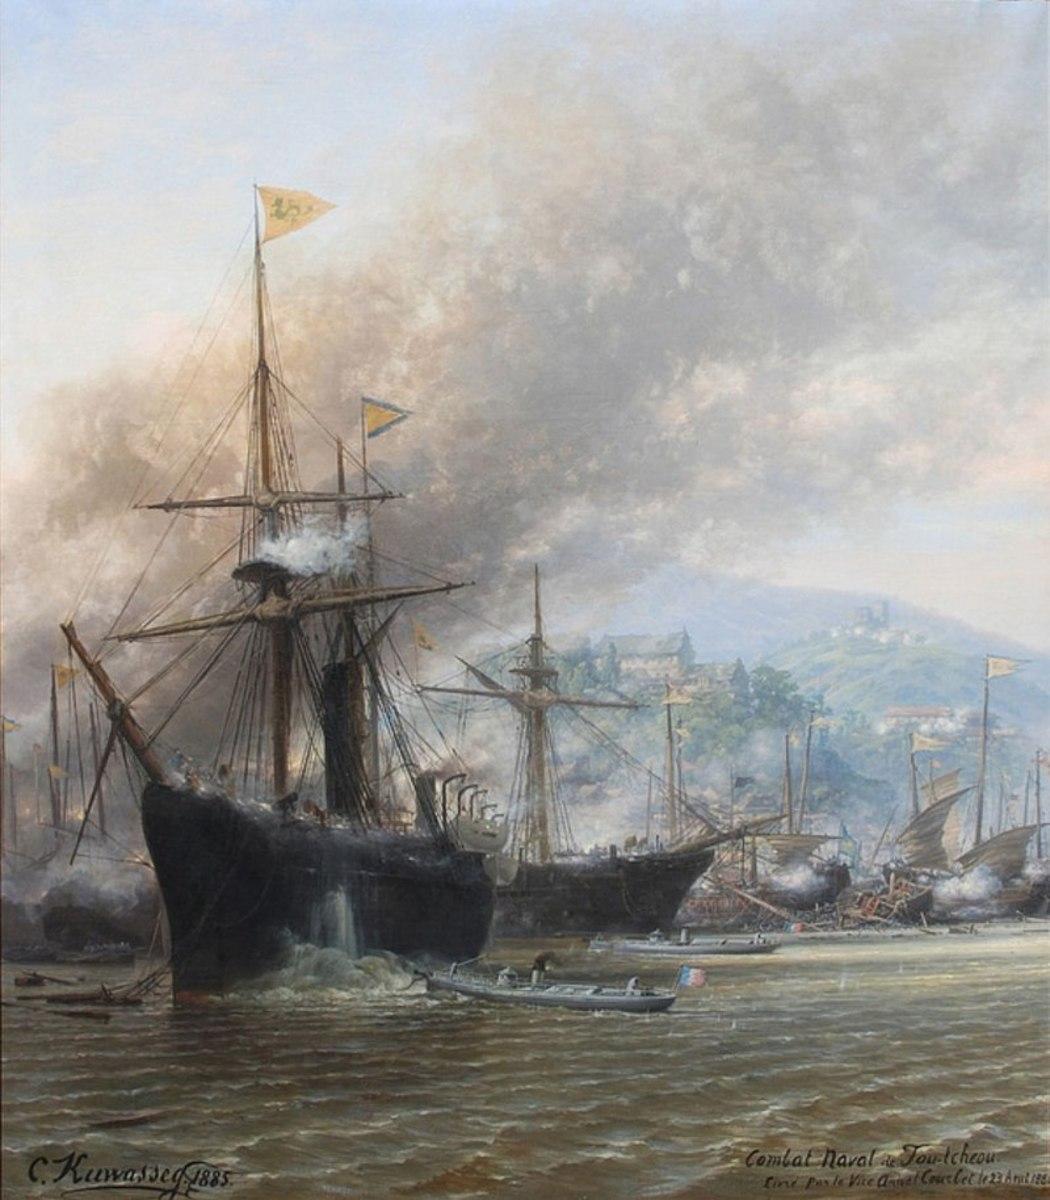 French torpedo boats attacking Chinese ships at Foochow